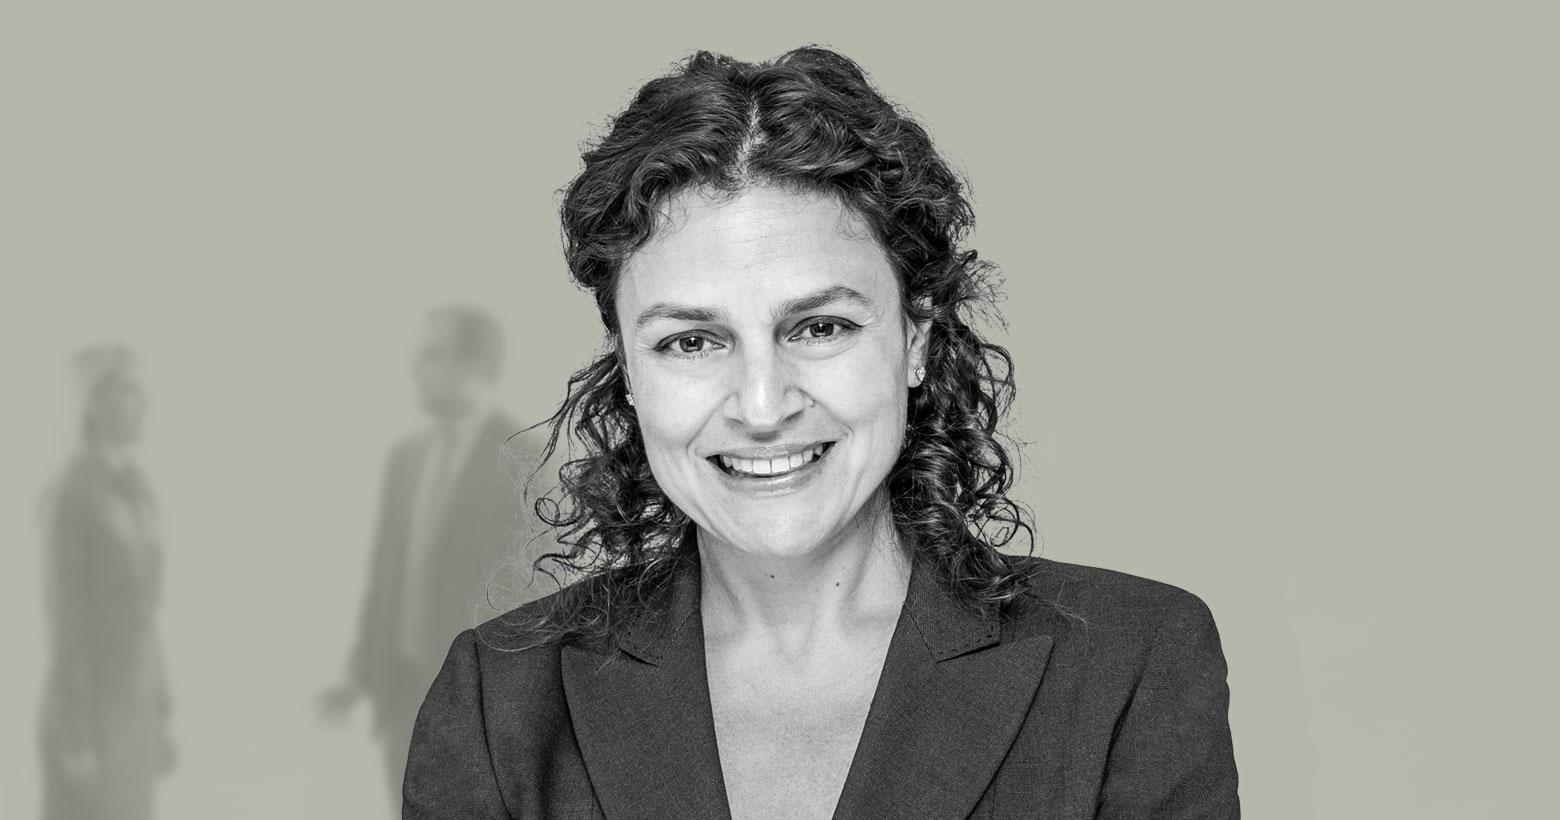 Kelly Karapetyan